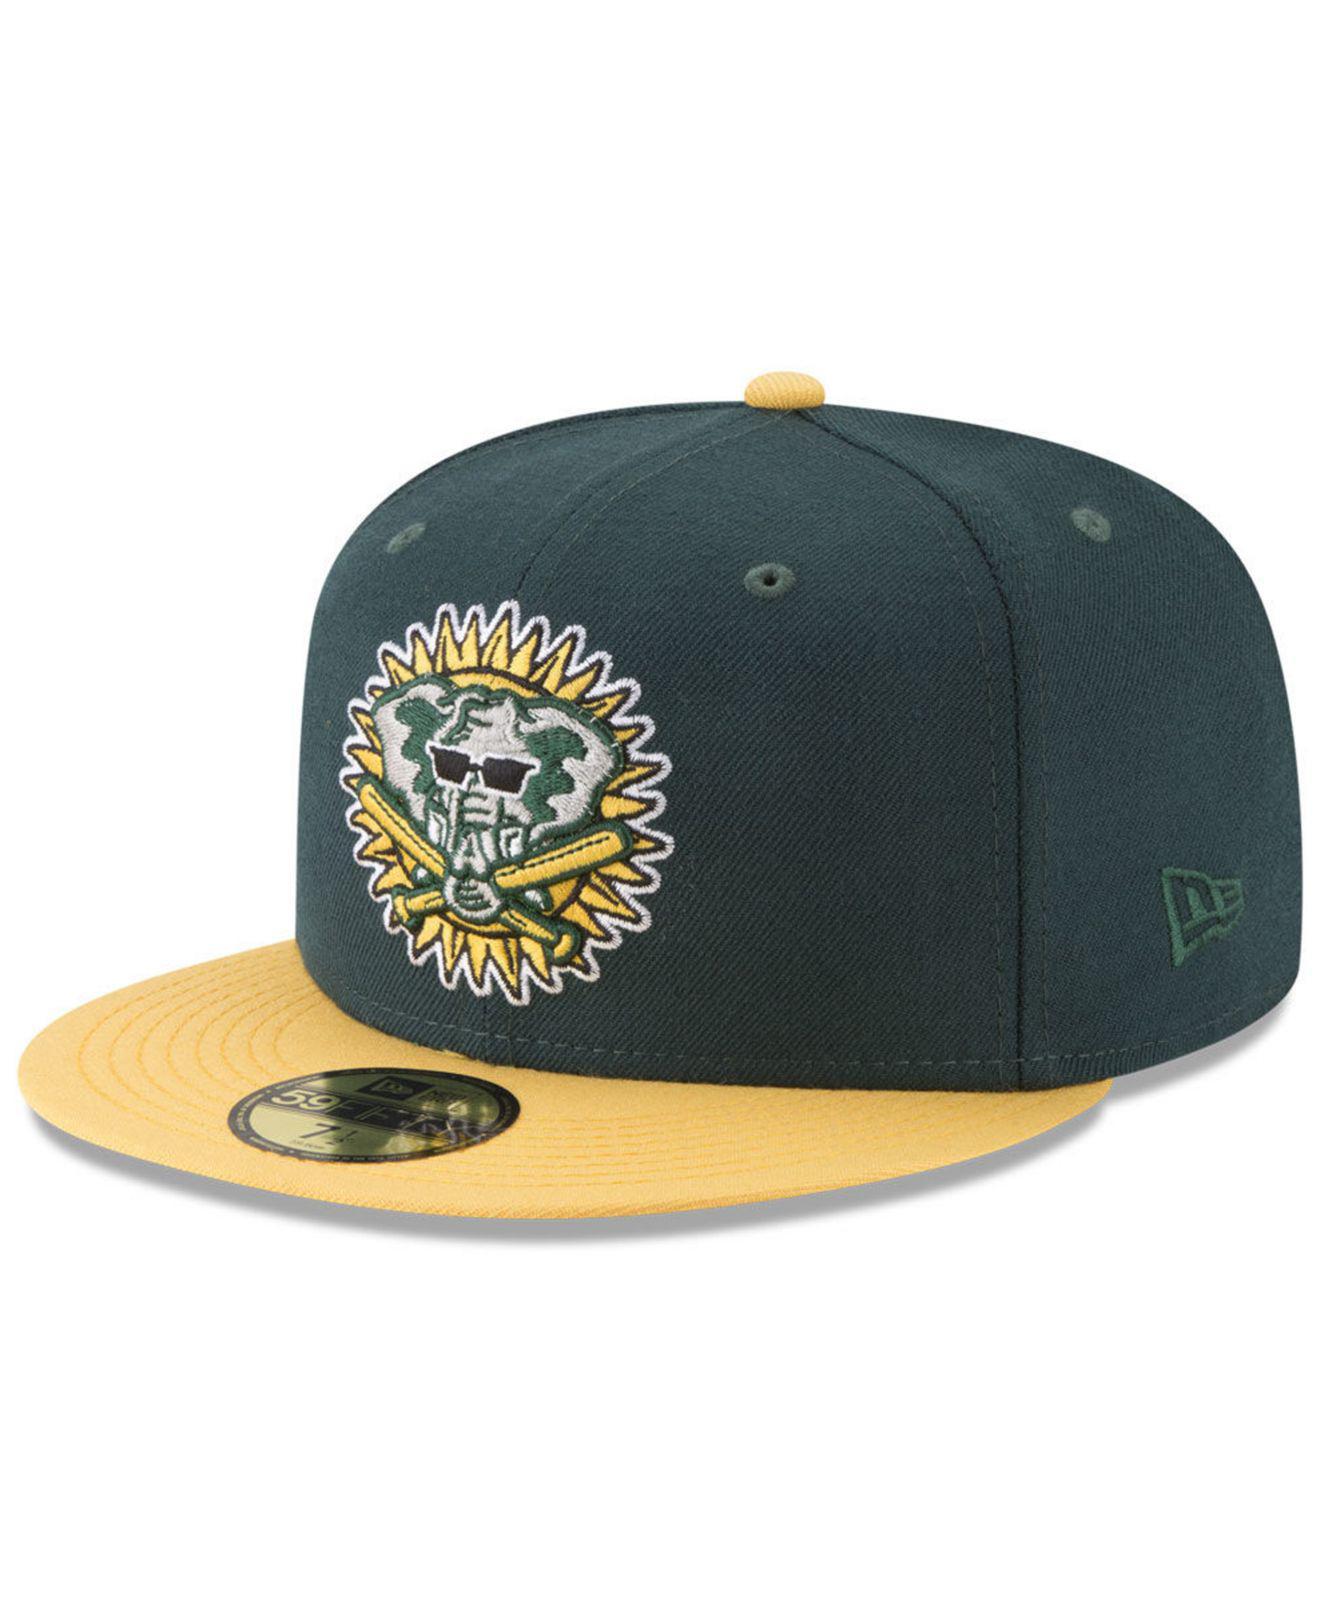 KTZ. Men s Green Oakland Athletics Batting Practice Wool Flip 59fifty  Fitted Cap 2b054c1fc6e3